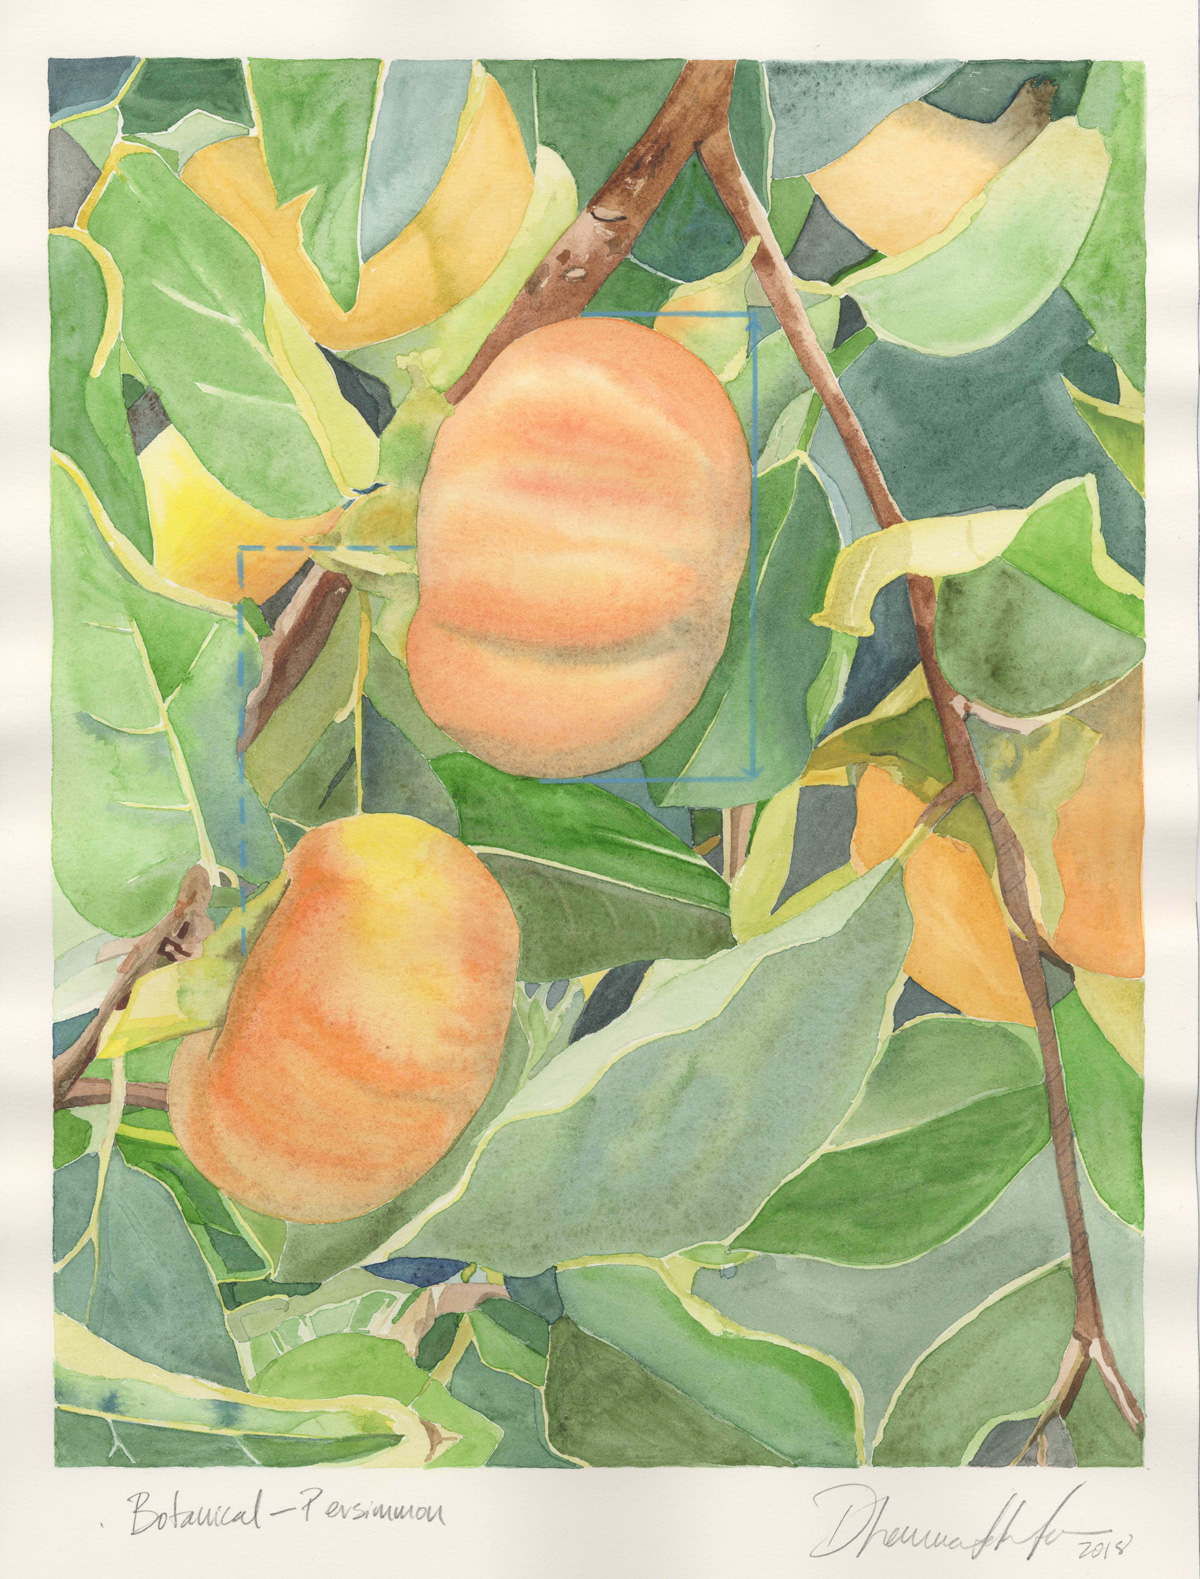 Botanical—Persimmon